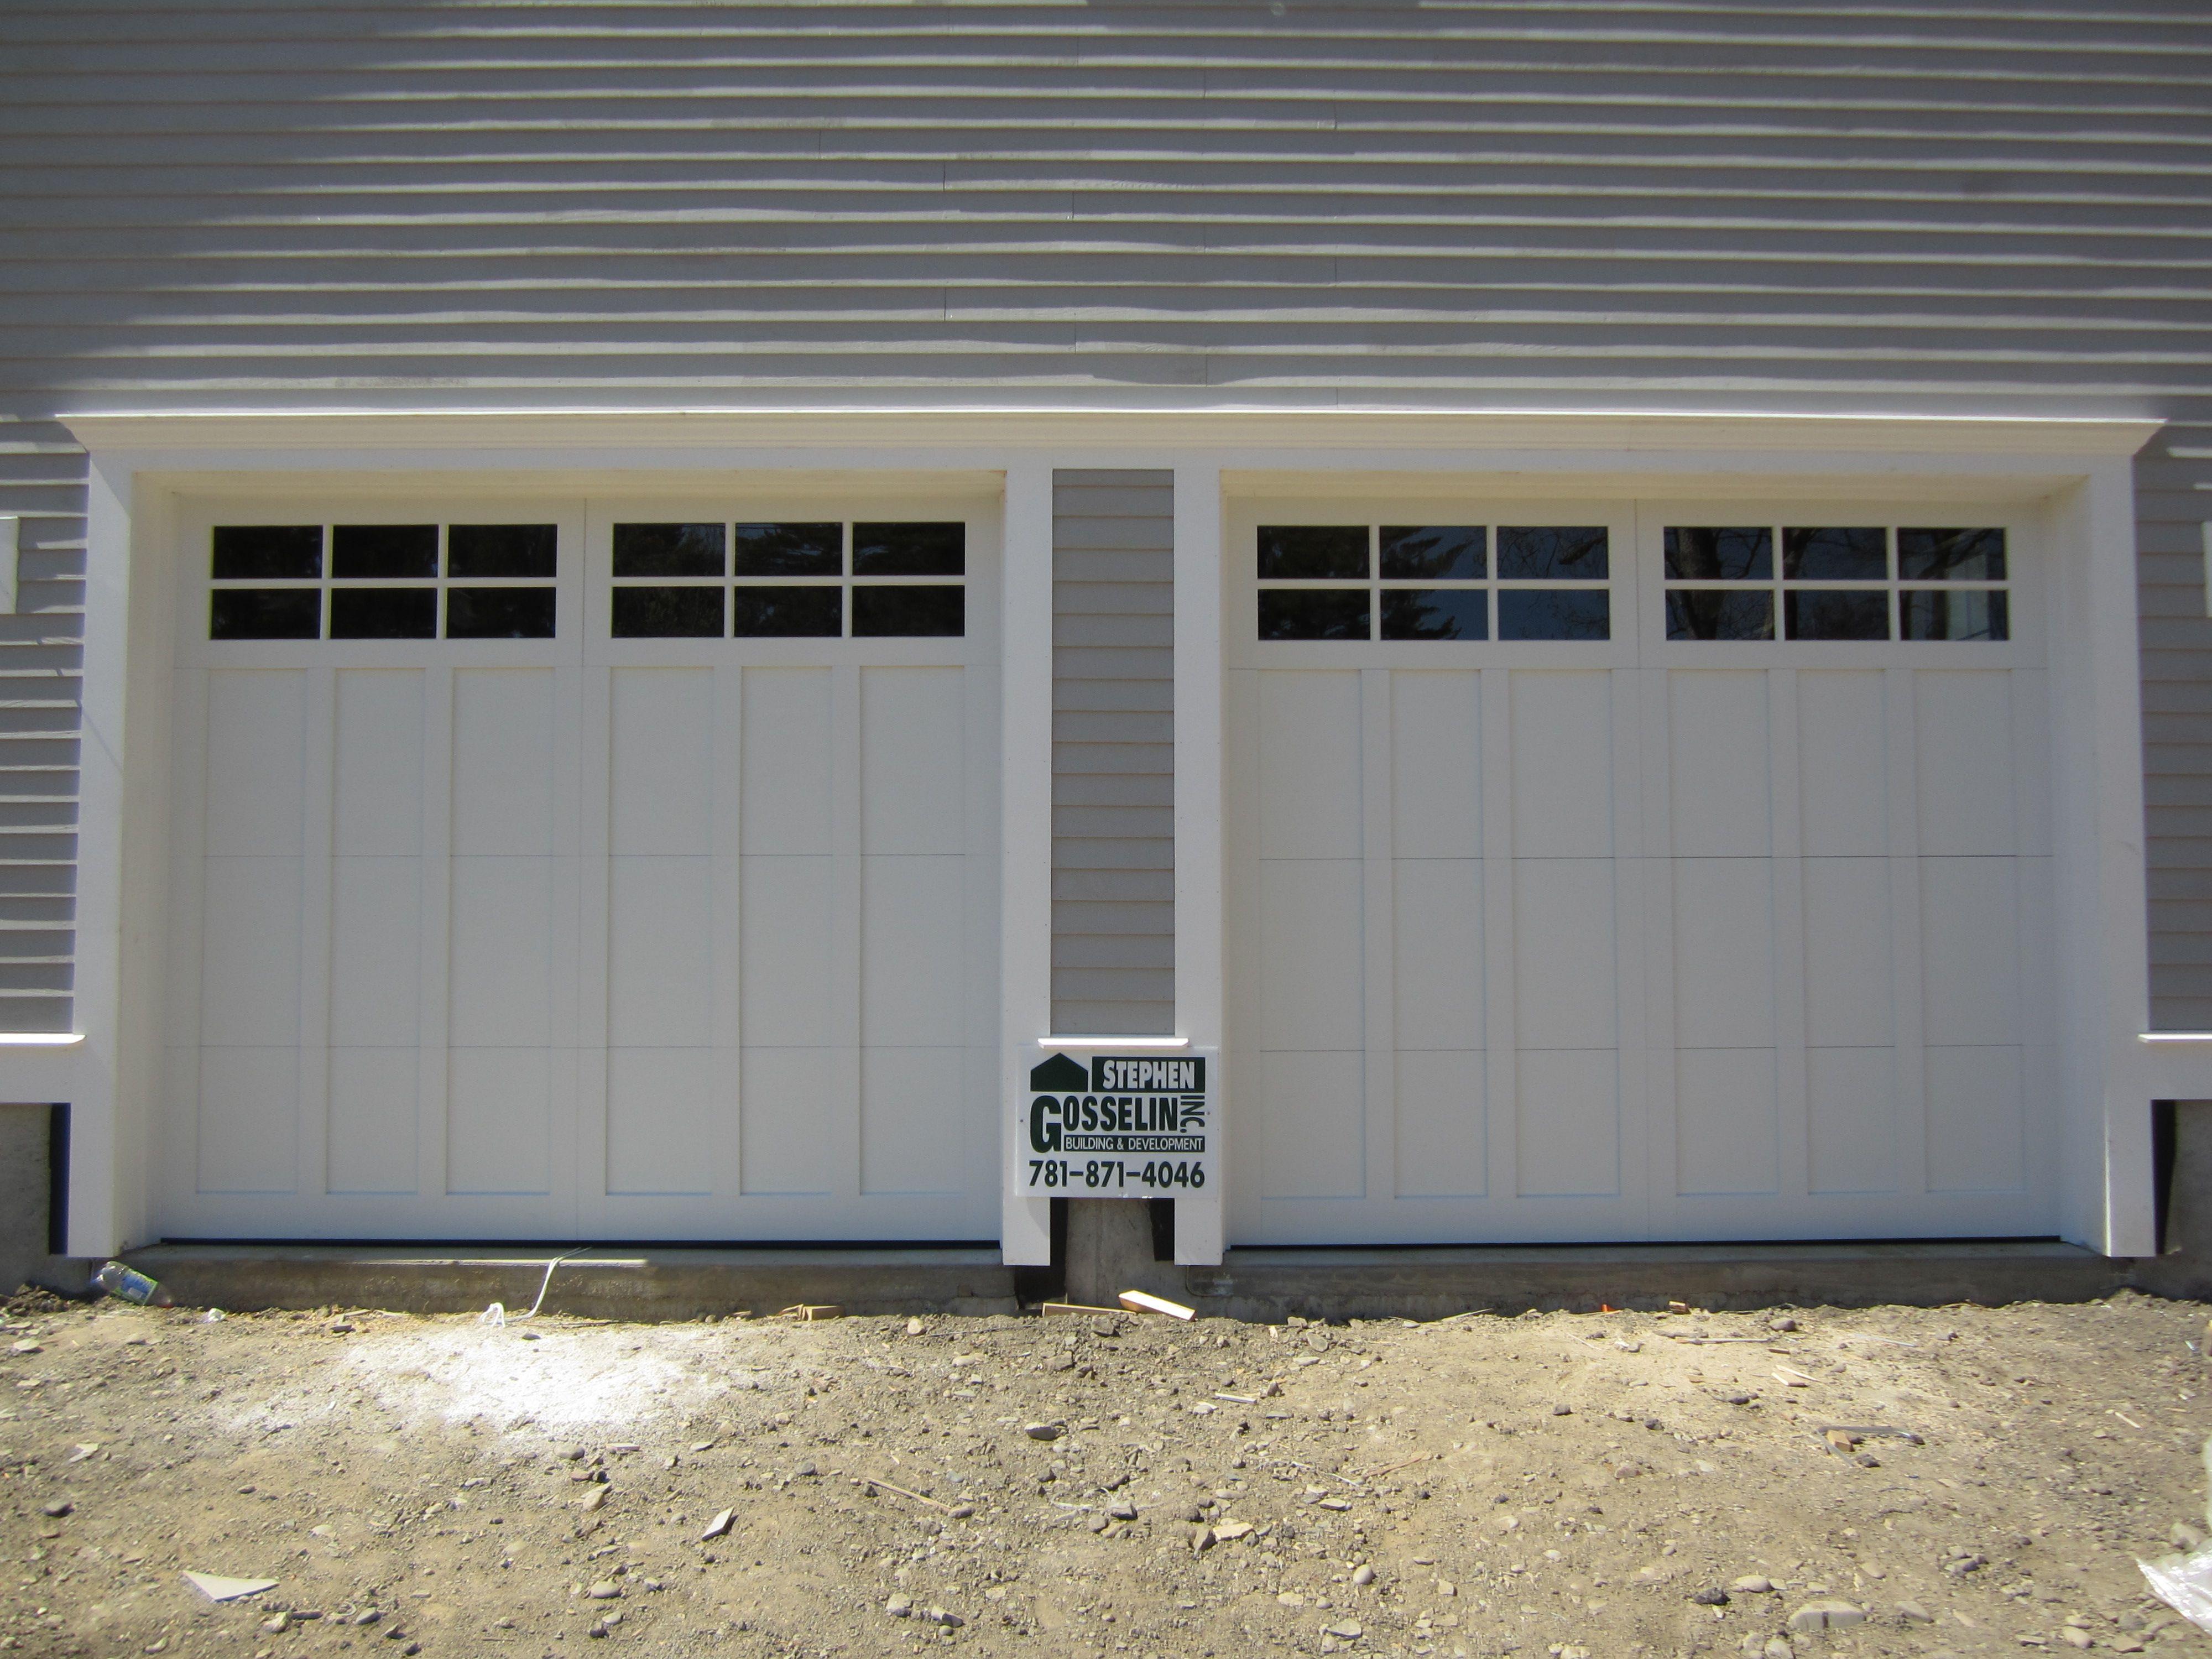 American Garage Home - 75dcd725b2cdce991f9c42cde82e08b9_Most Inspiring American Garage Home - 75dcd725b2cdce991f9c42cde82e08b9  Pictures_748696.jpg